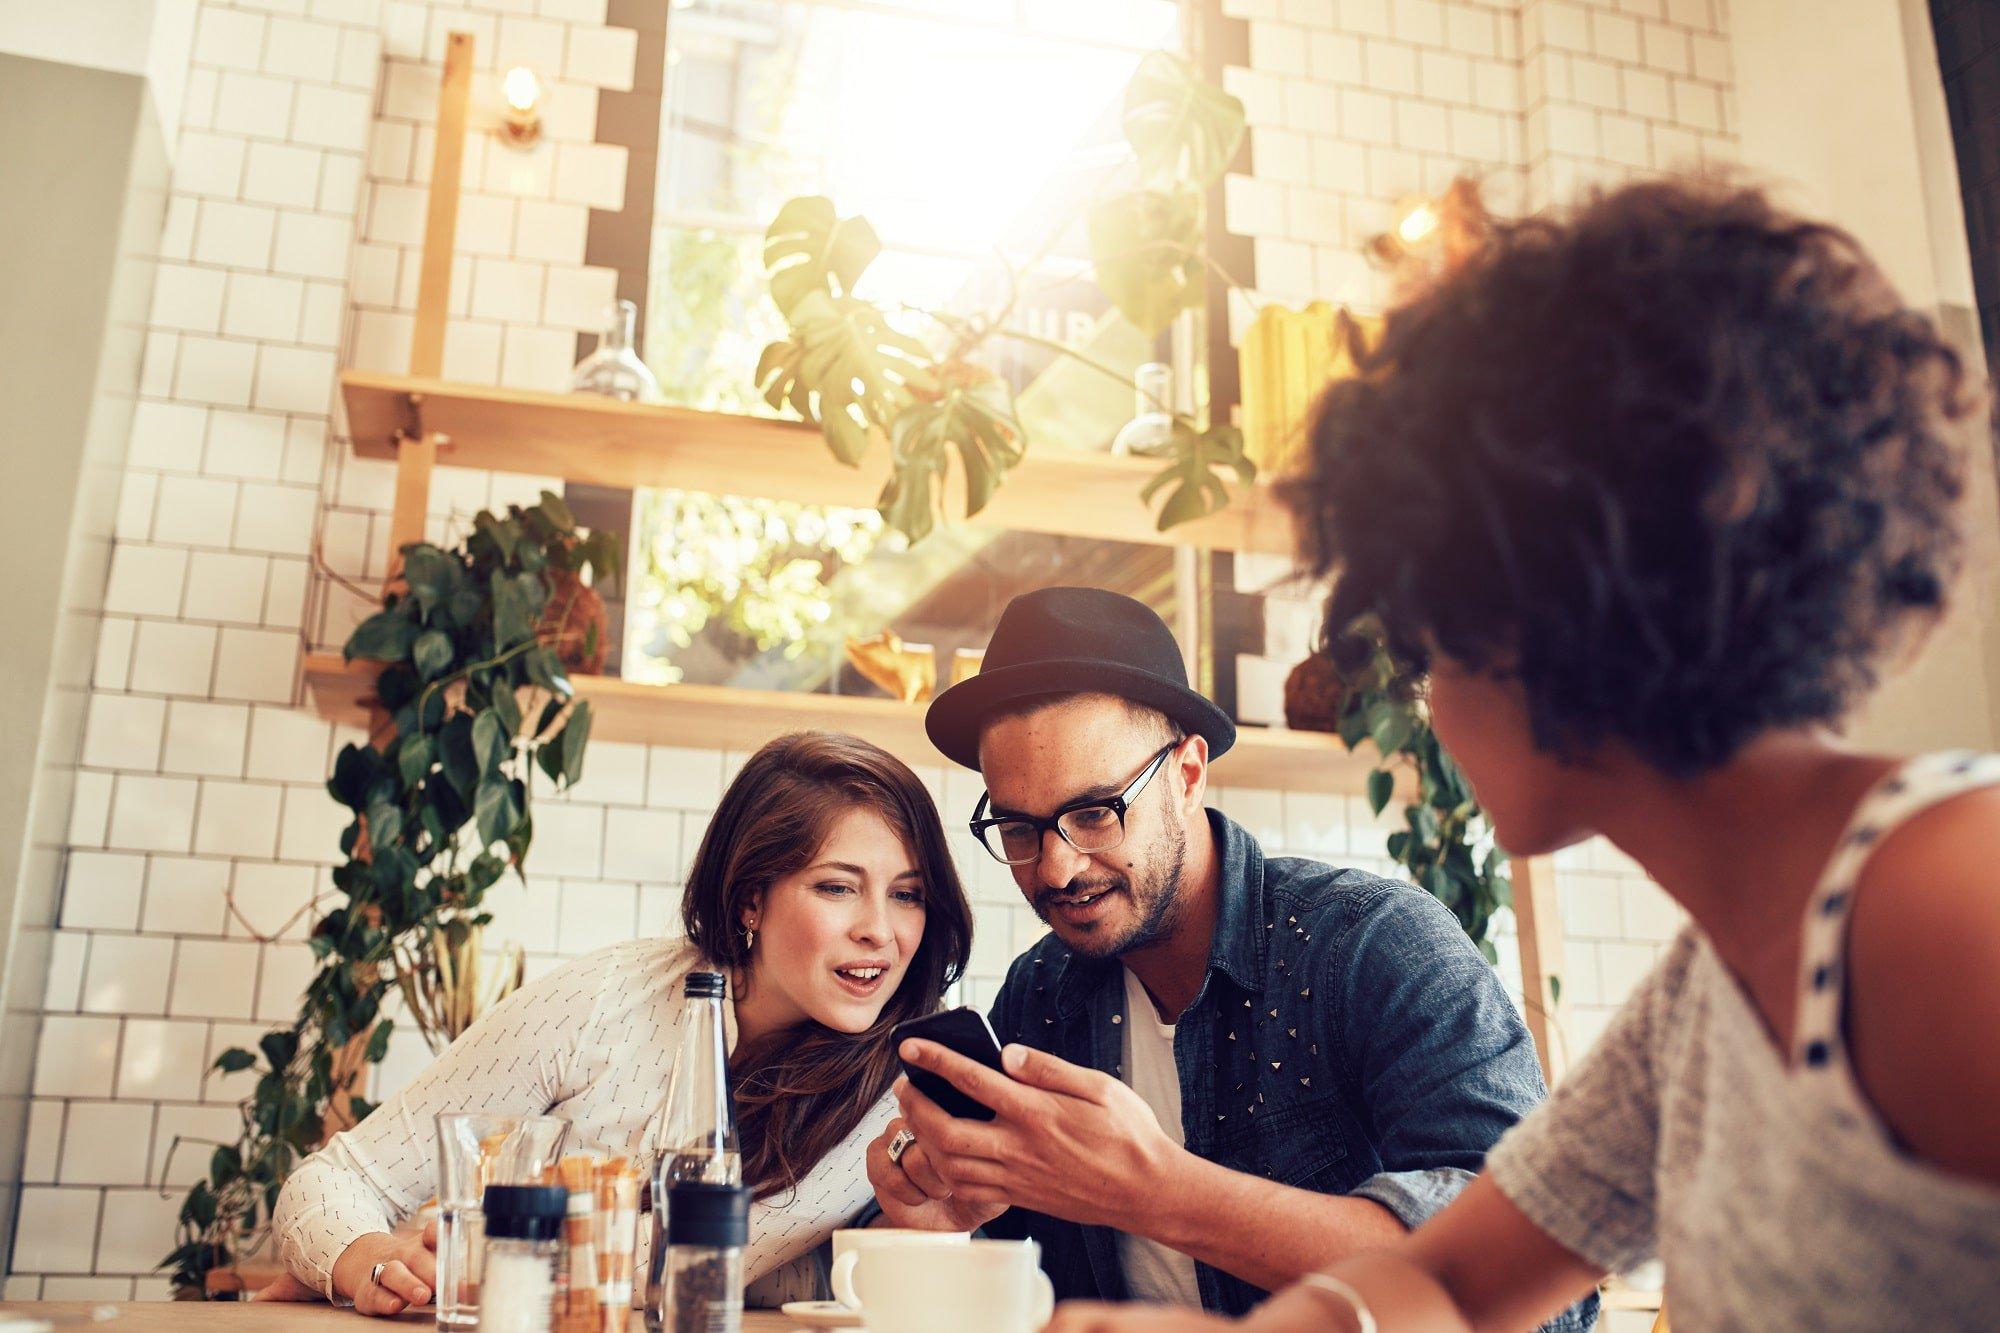 Friends using smartphone in a restaurant